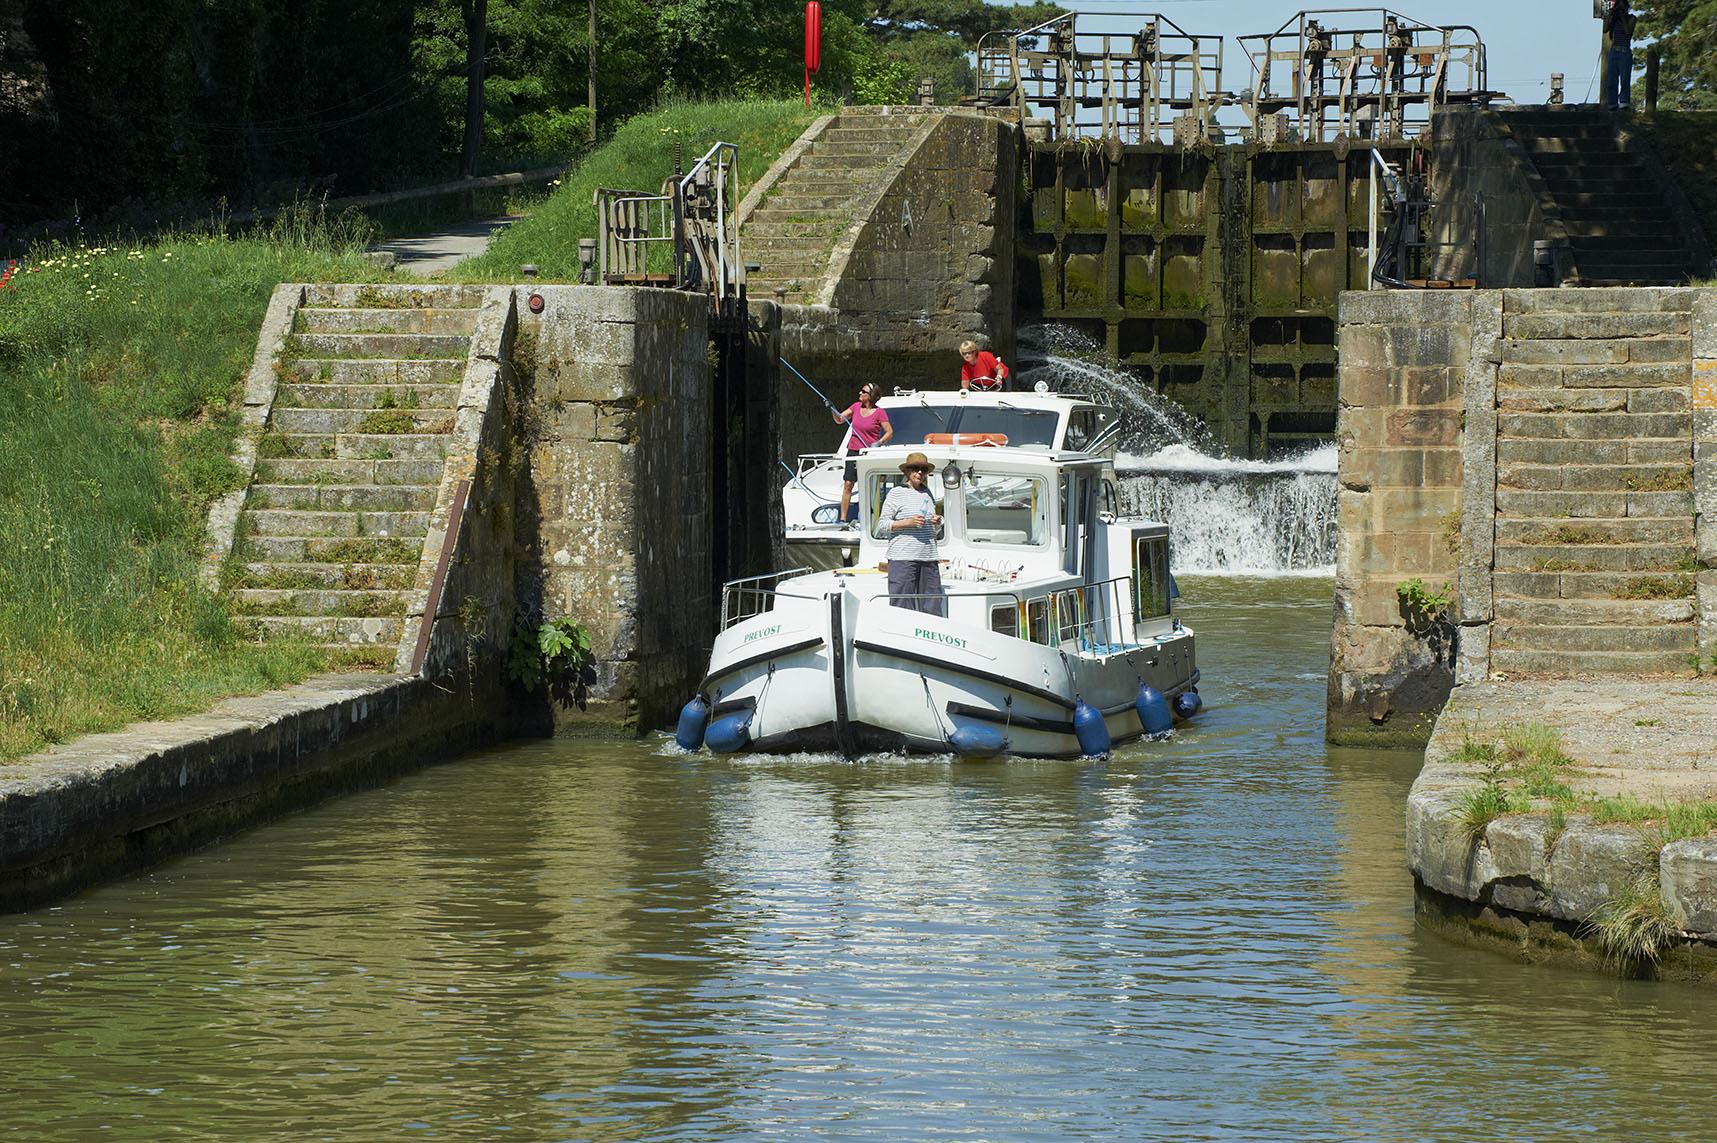 France, Languedoc-Roussillon, Aude (11), Canal du Midi, lock of Pechlaurier